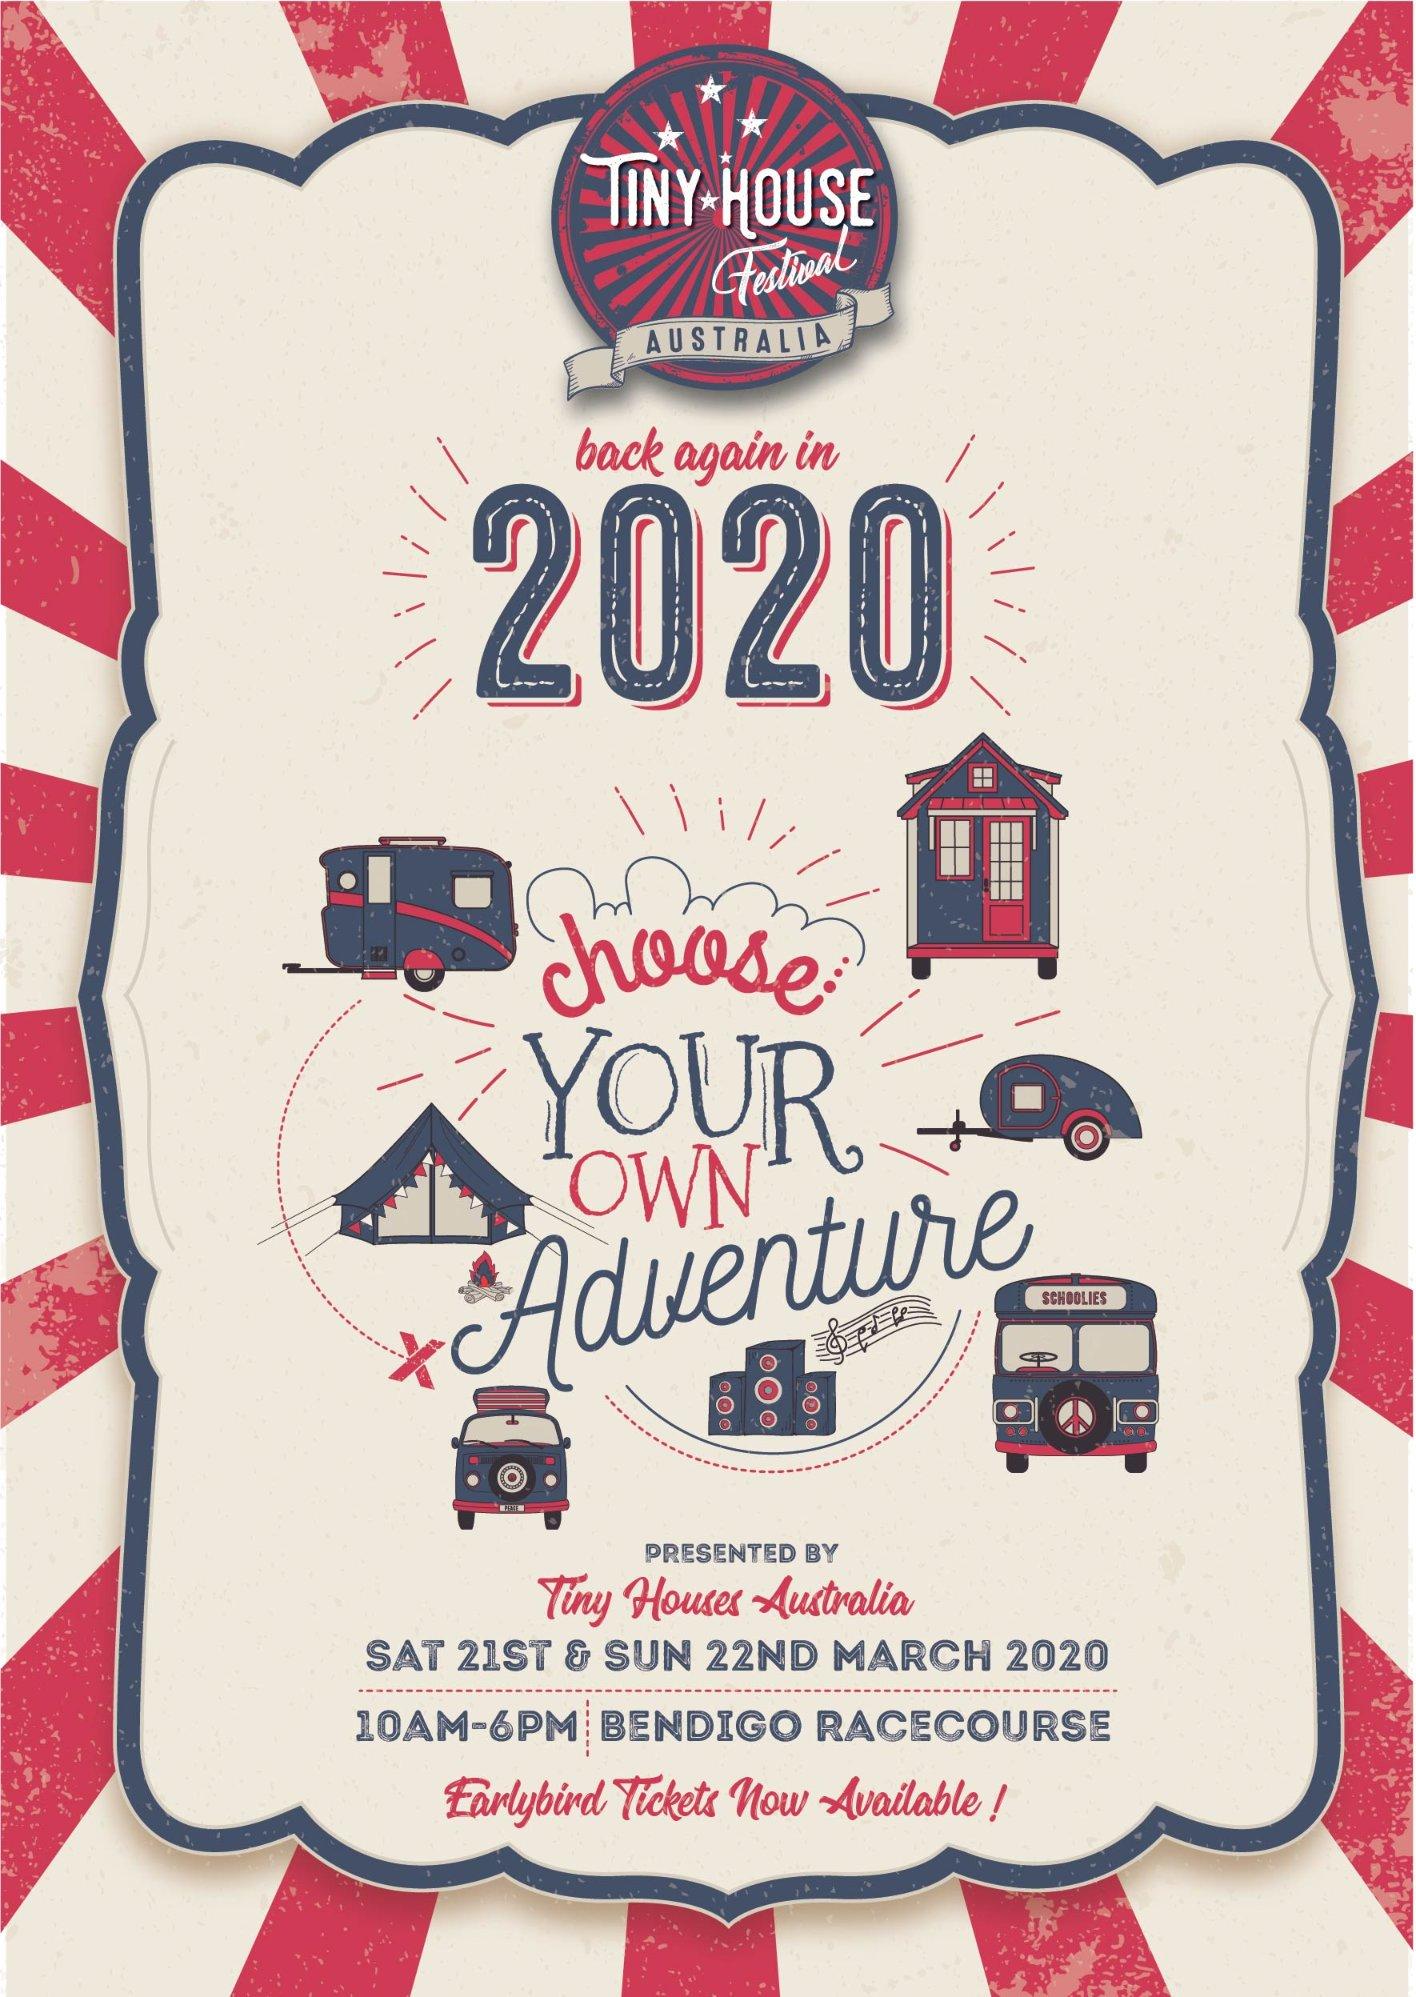 Tiny House Festival 2020.2020 Tiny House Festival Australia Trybooking Australia